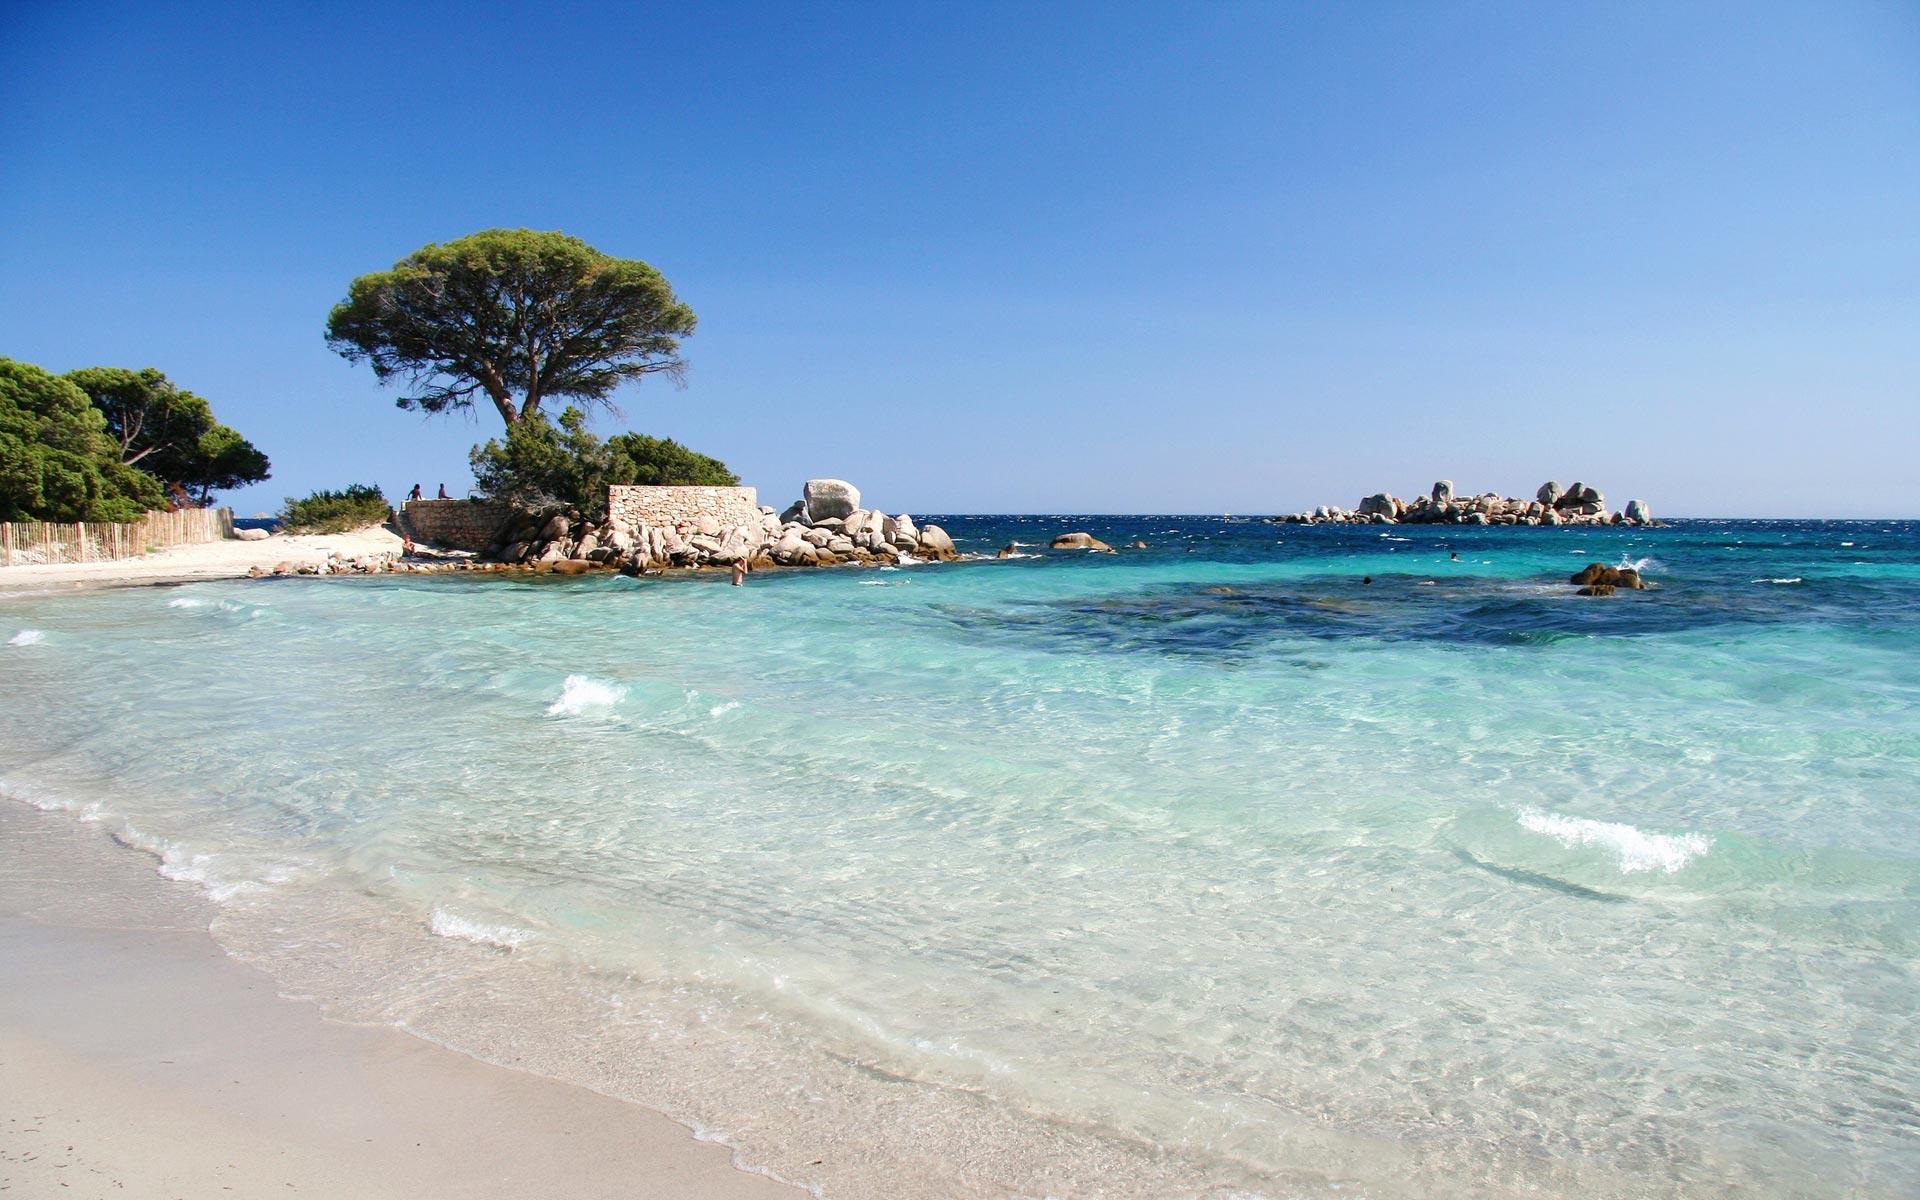 Noleggio Barche Santa Manza - Navalia | Noleggia un Sogno